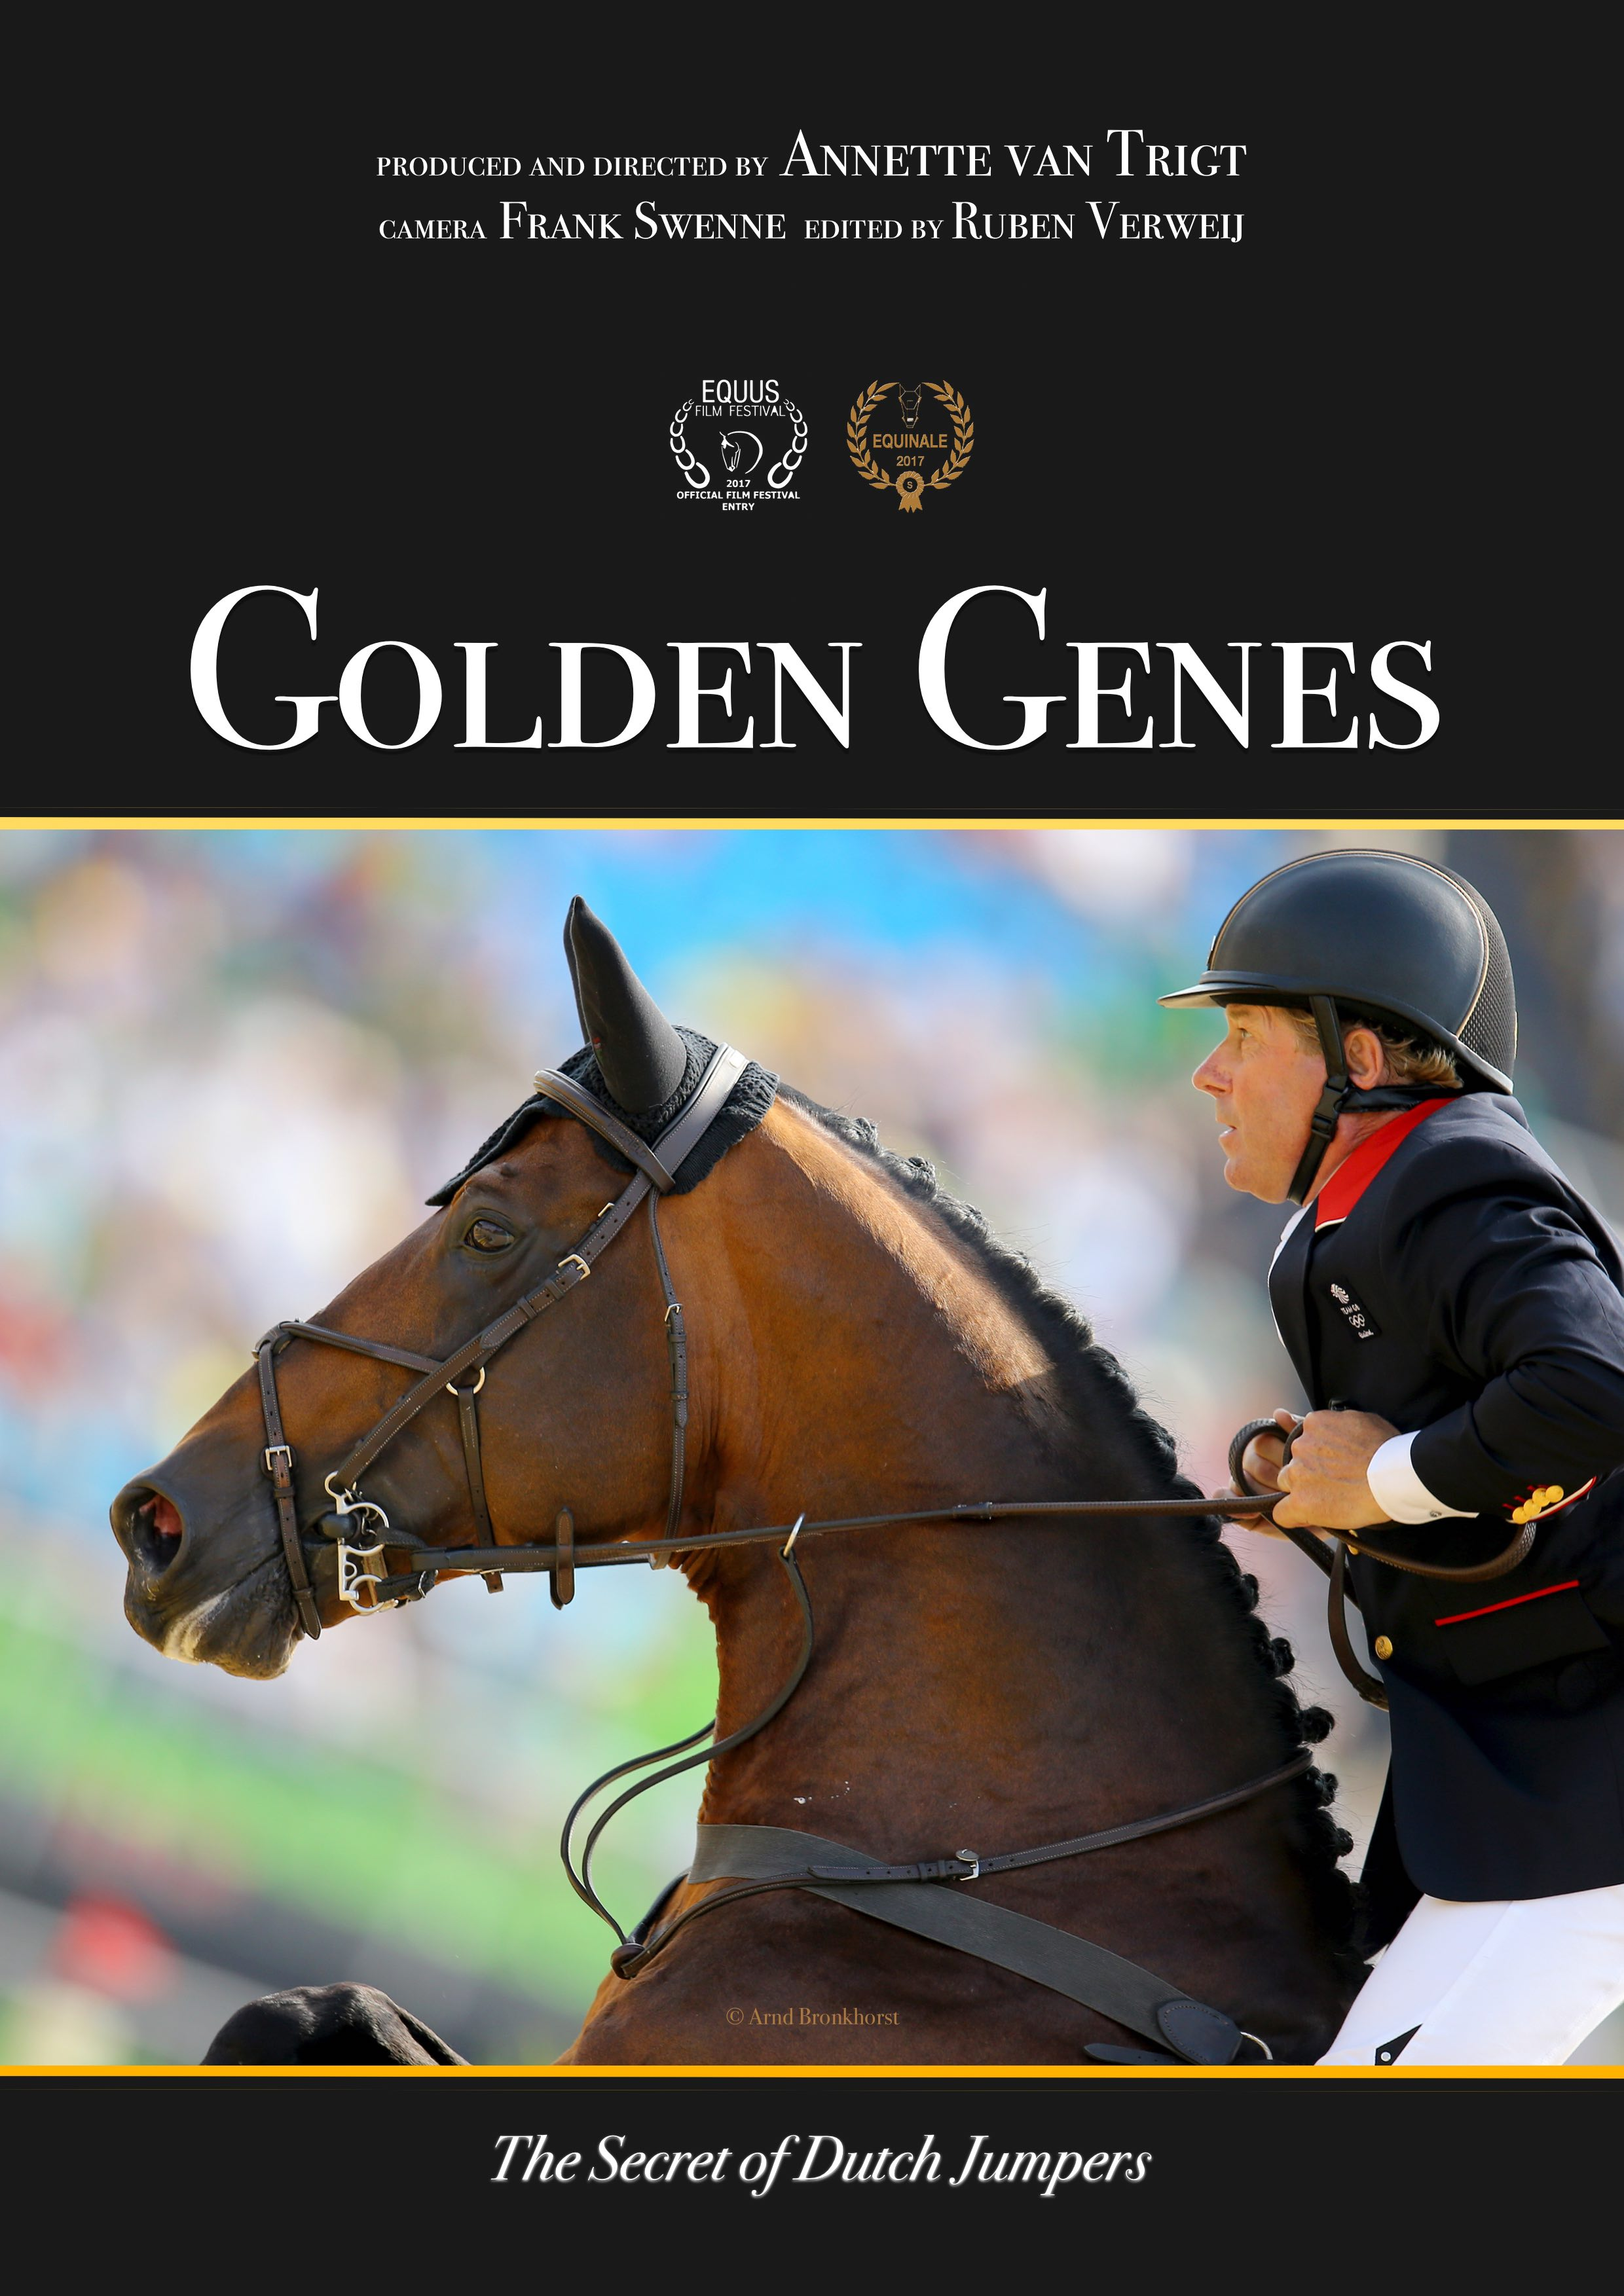 FILM - GOLDEN GENES reduced